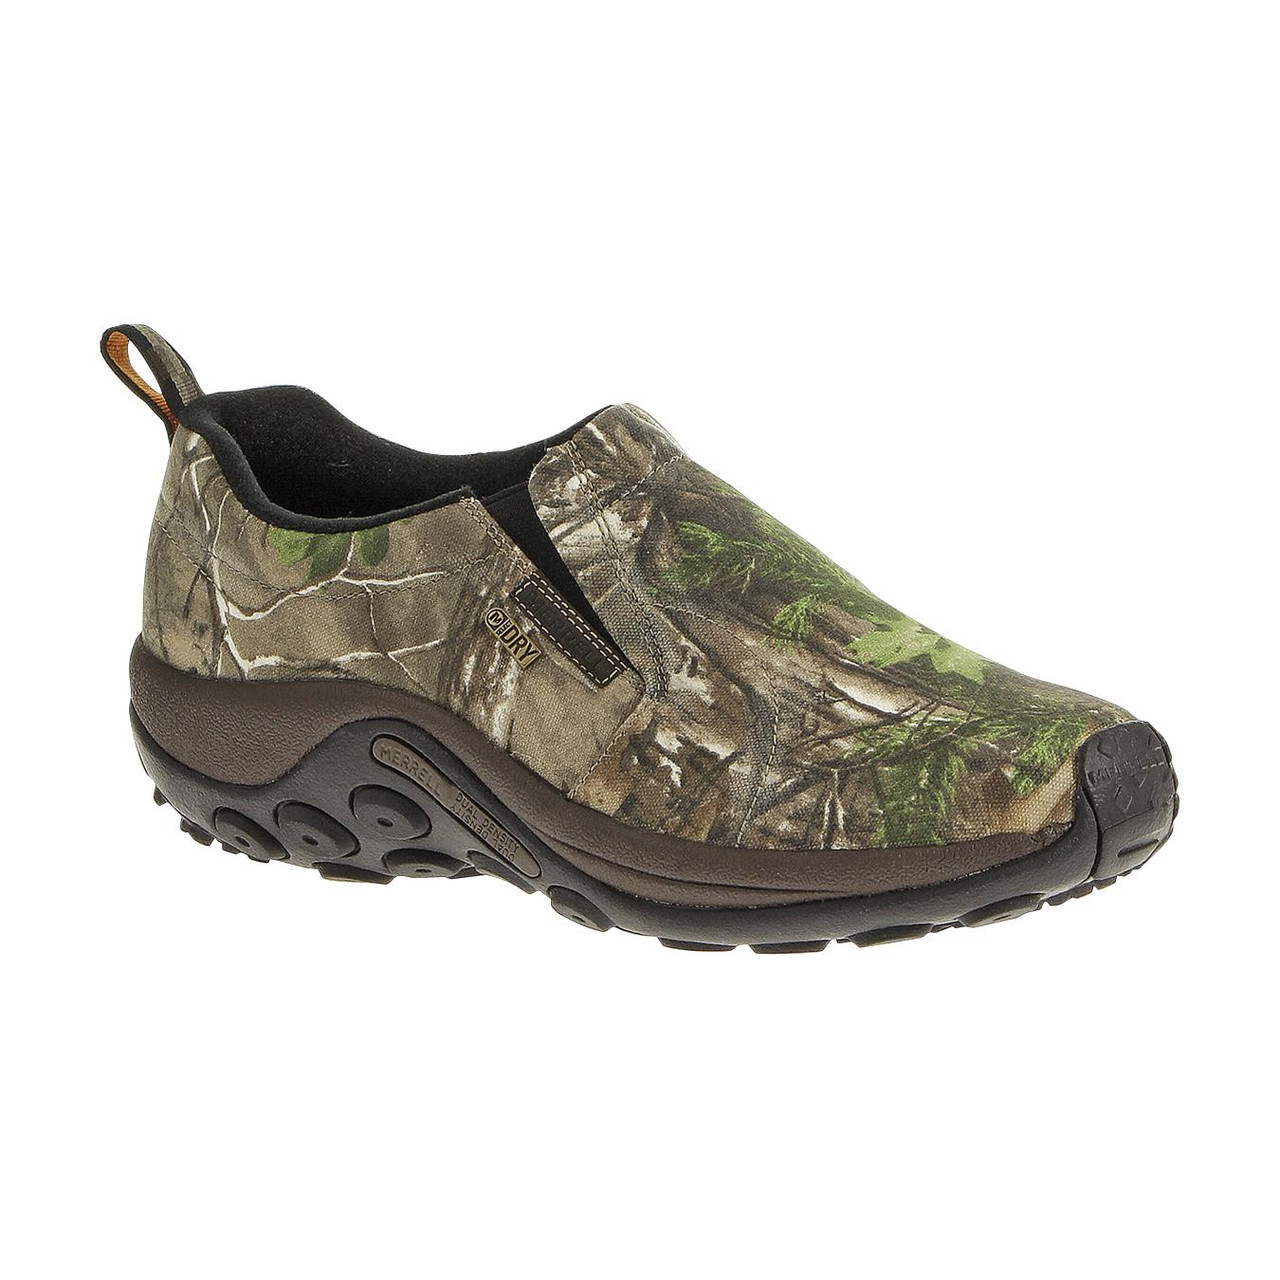 Merrell Jungle Moc Camo Slip-On Hiker